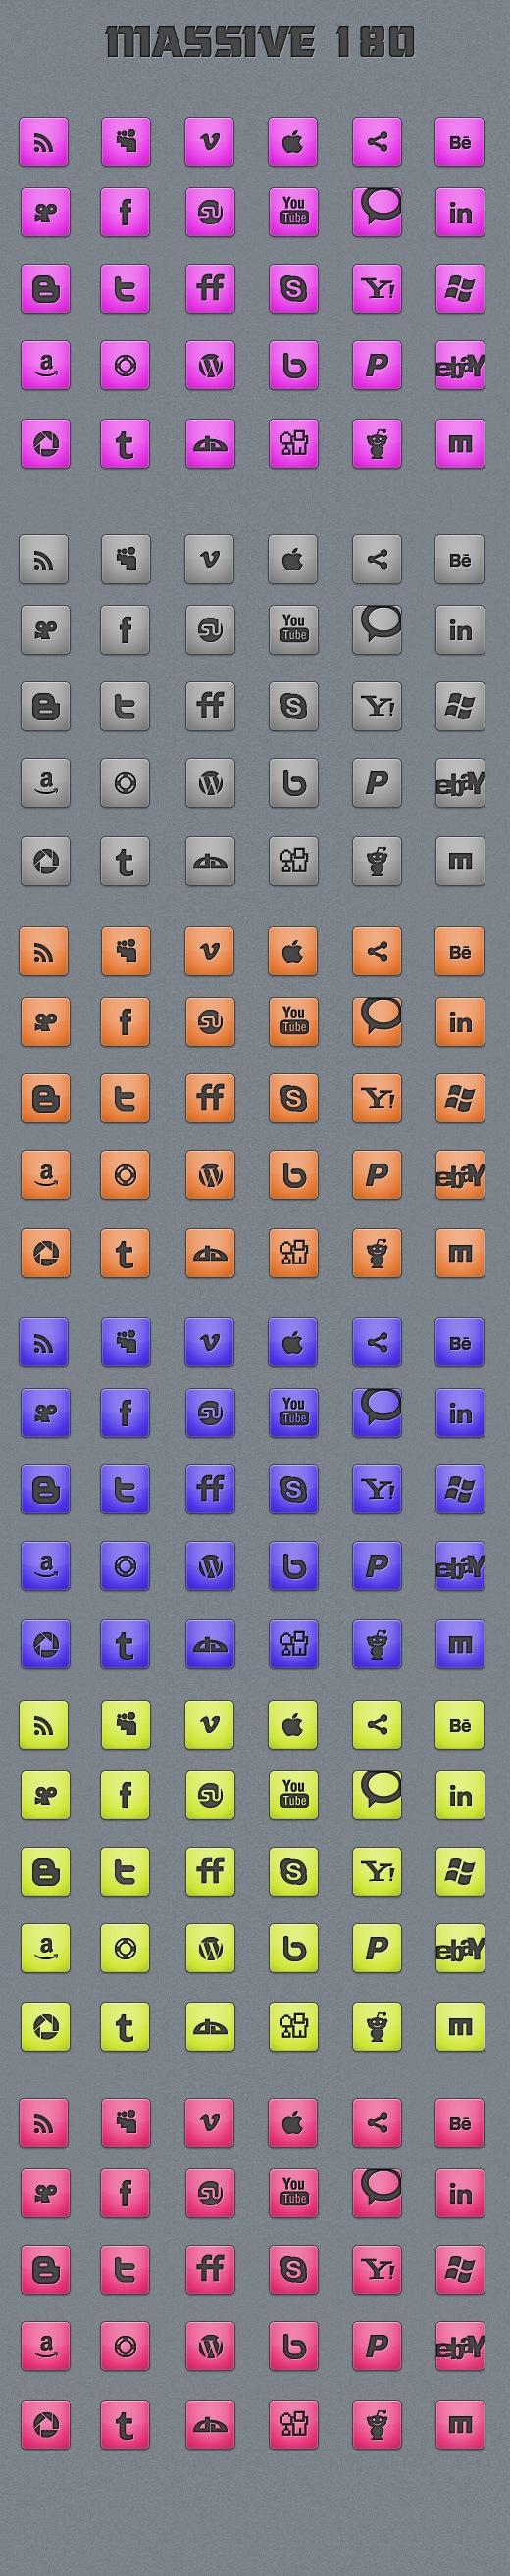 M8 +180 Massive Minimalistic Icon set